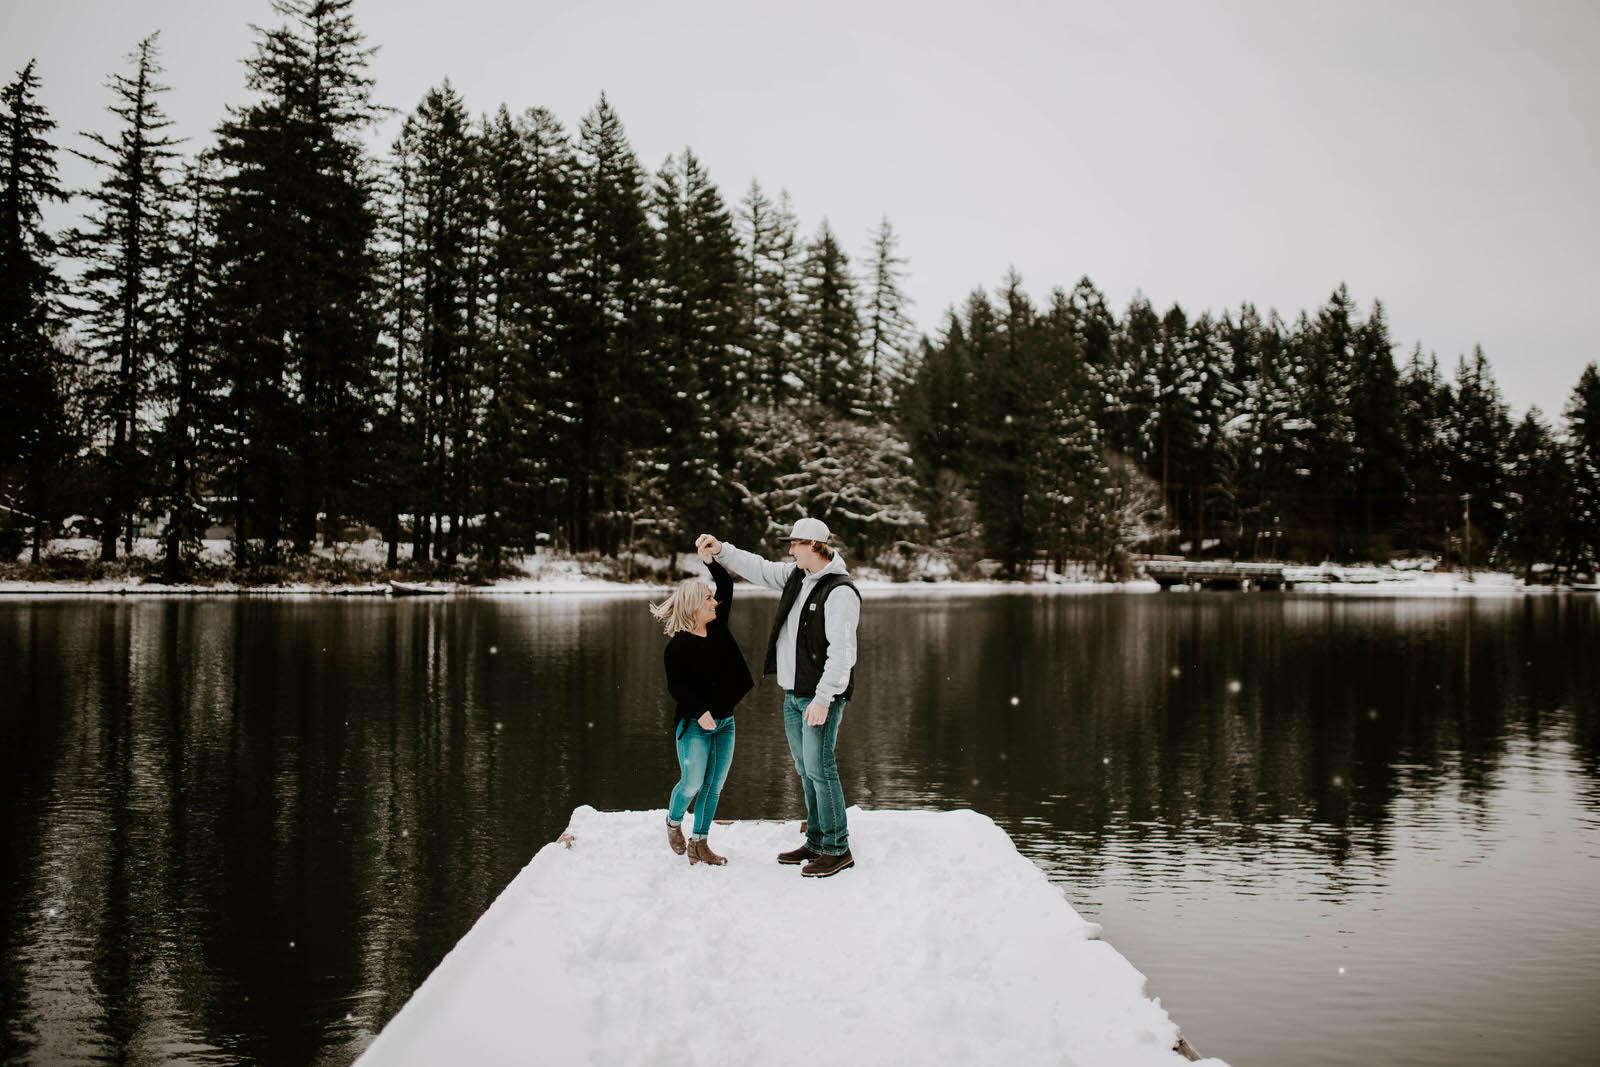 lacamas lake fallen leaf park camas washington jamie carle engagement session snow winter dock water vancouver feminist queer lgbtq wedding photographer